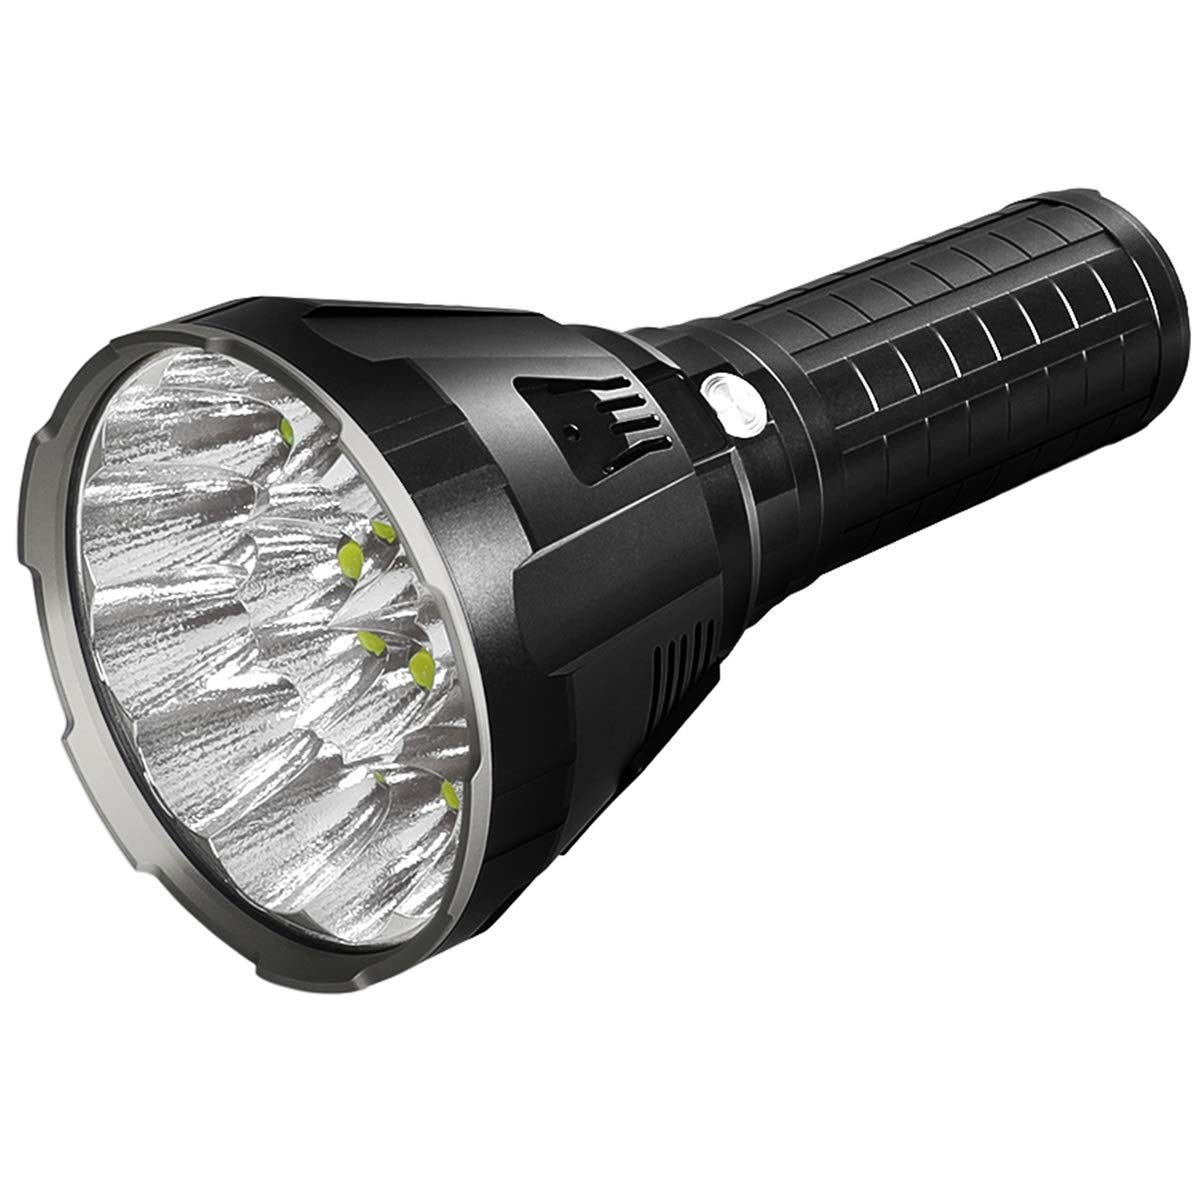 The IMALENT MS18 flashlight.